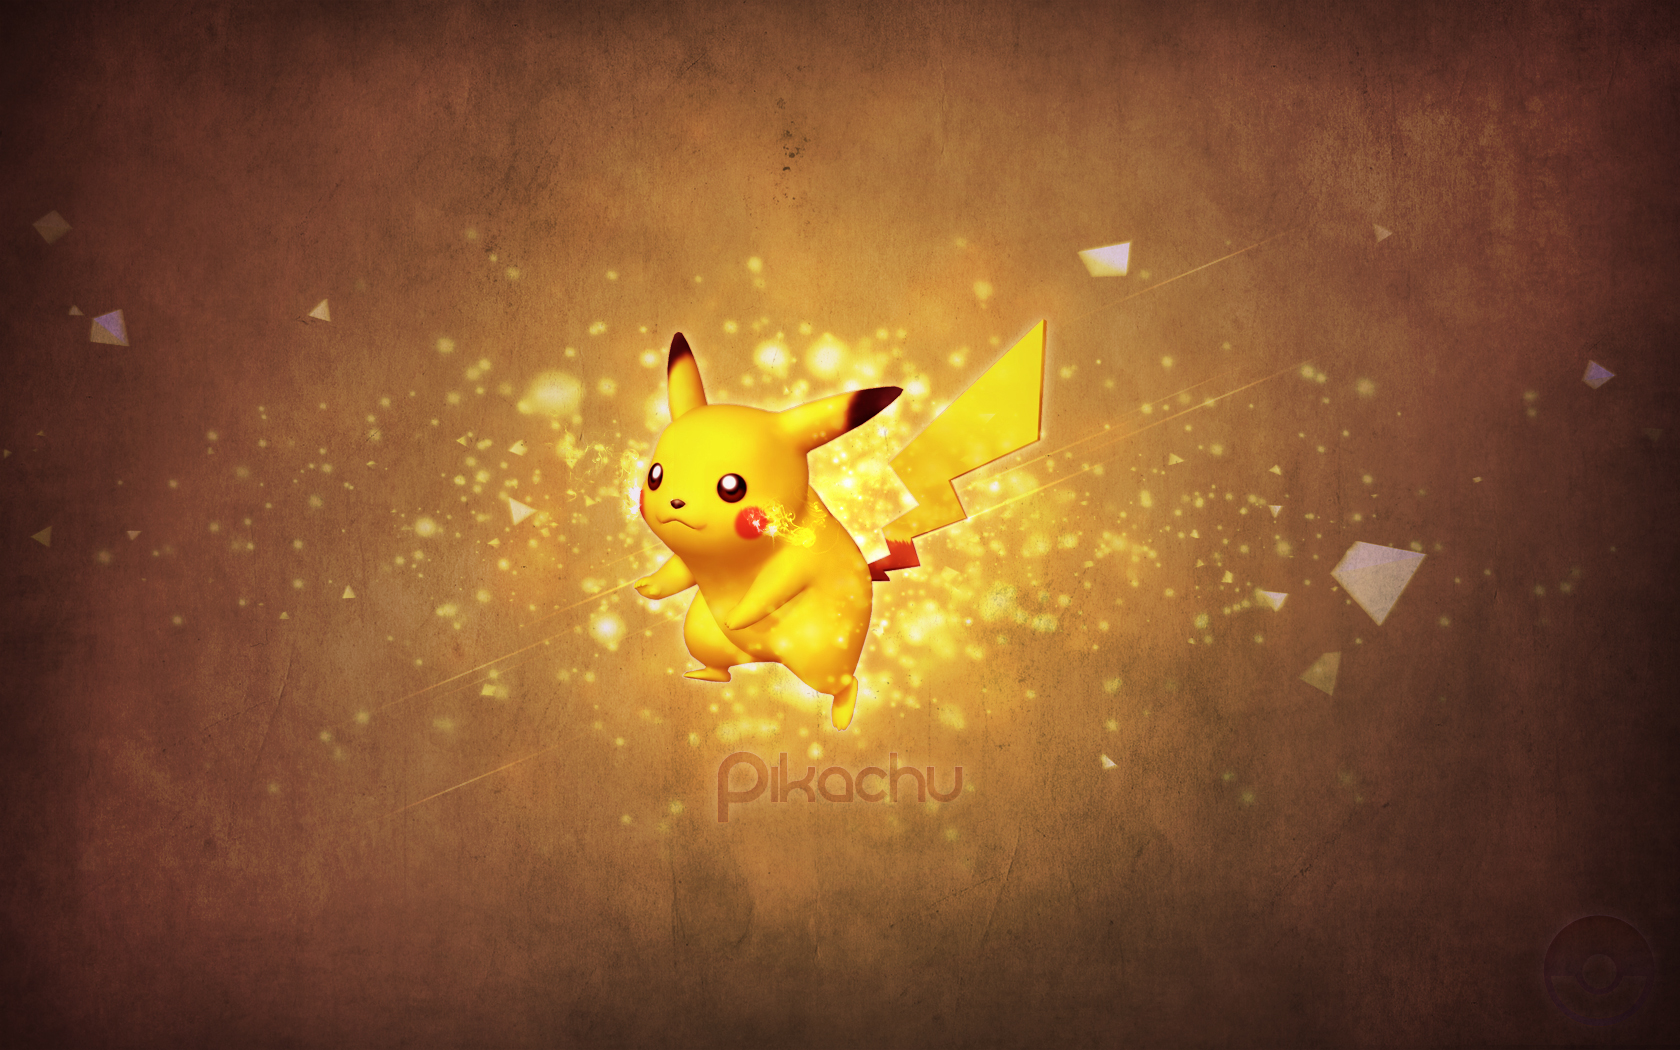 Pikachu Wallpaper 58 Go